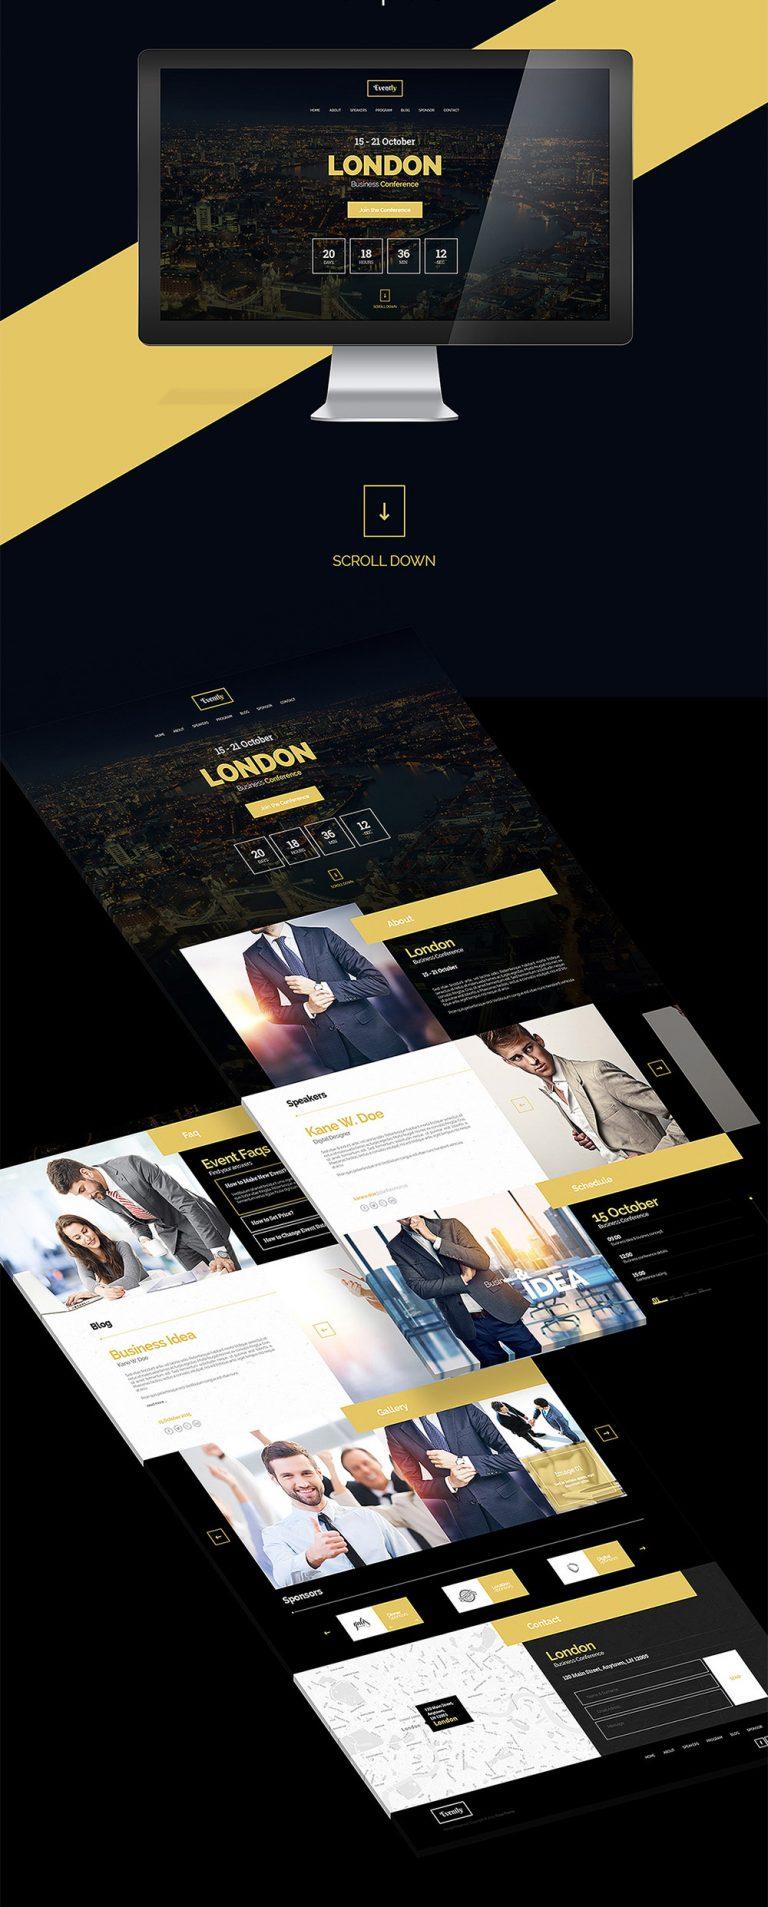 Business Event Invitation Website Template PSD